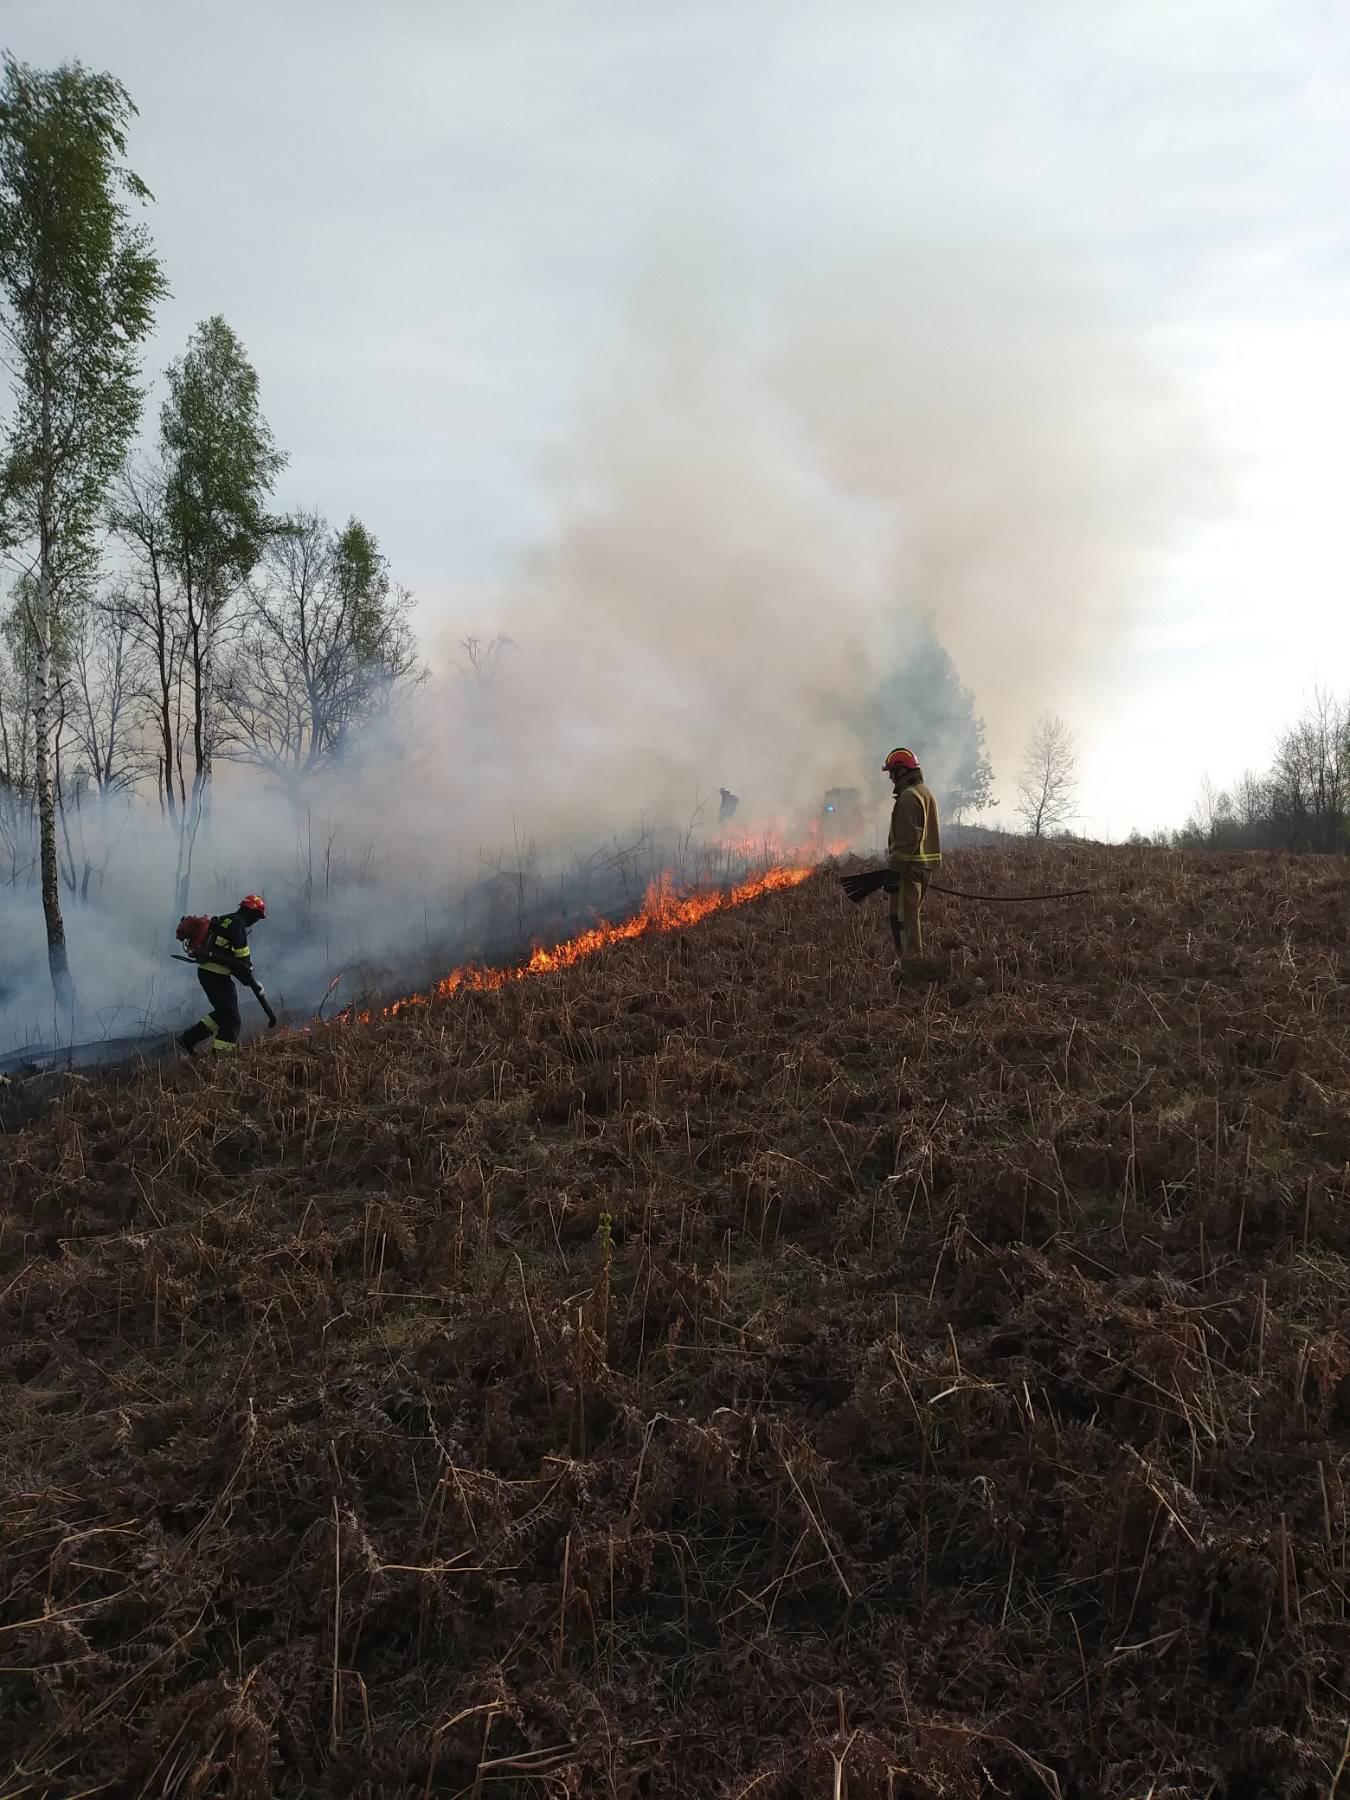 Vatrogasci ljuti: 'Tko normalan još podmeće požar na Uskrs?!'